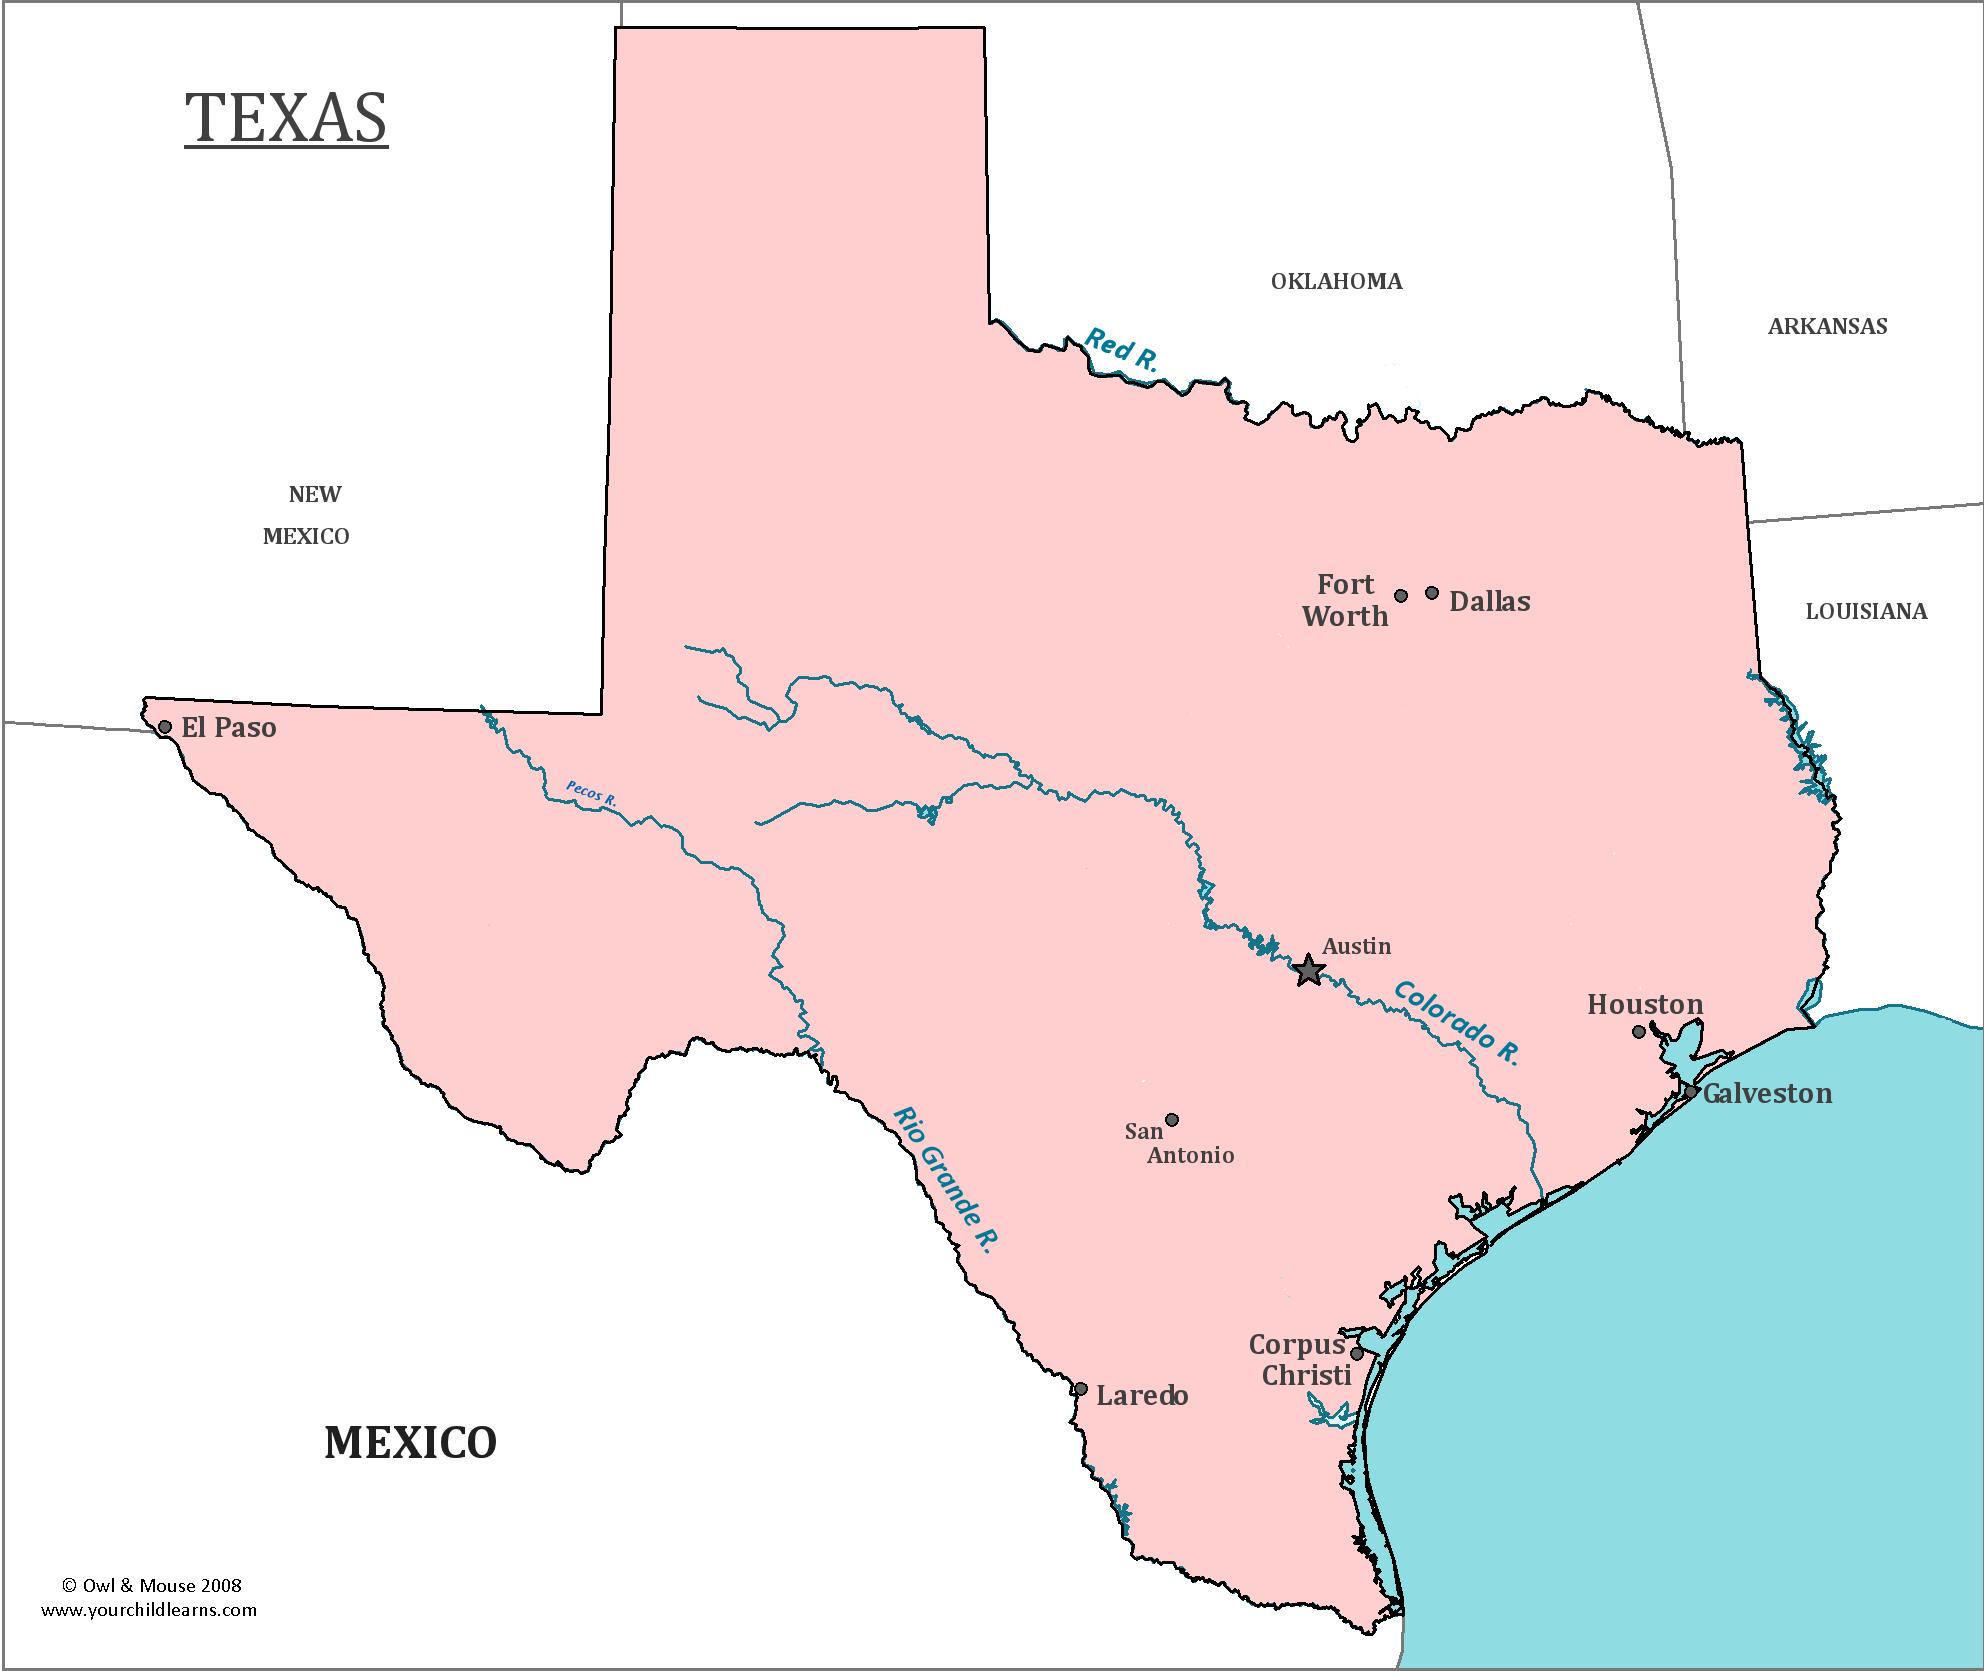 Sabine River Map Sabine River Texas Map | Business Ideas 2013